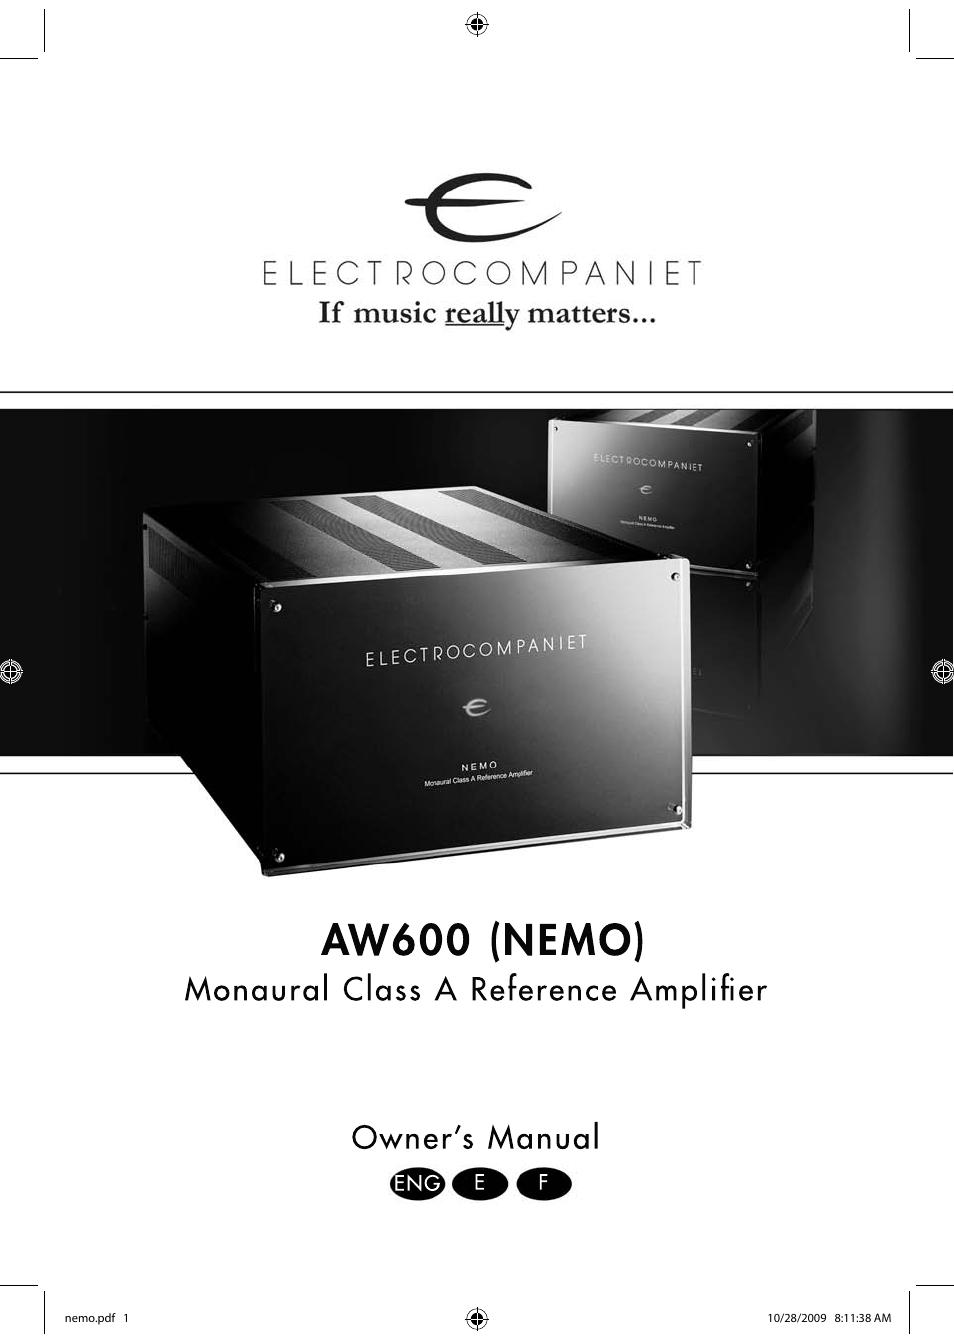 electrocompaniet nemo user manual 20 pages rh manualsdir com Cartoon Manual Service Manuals